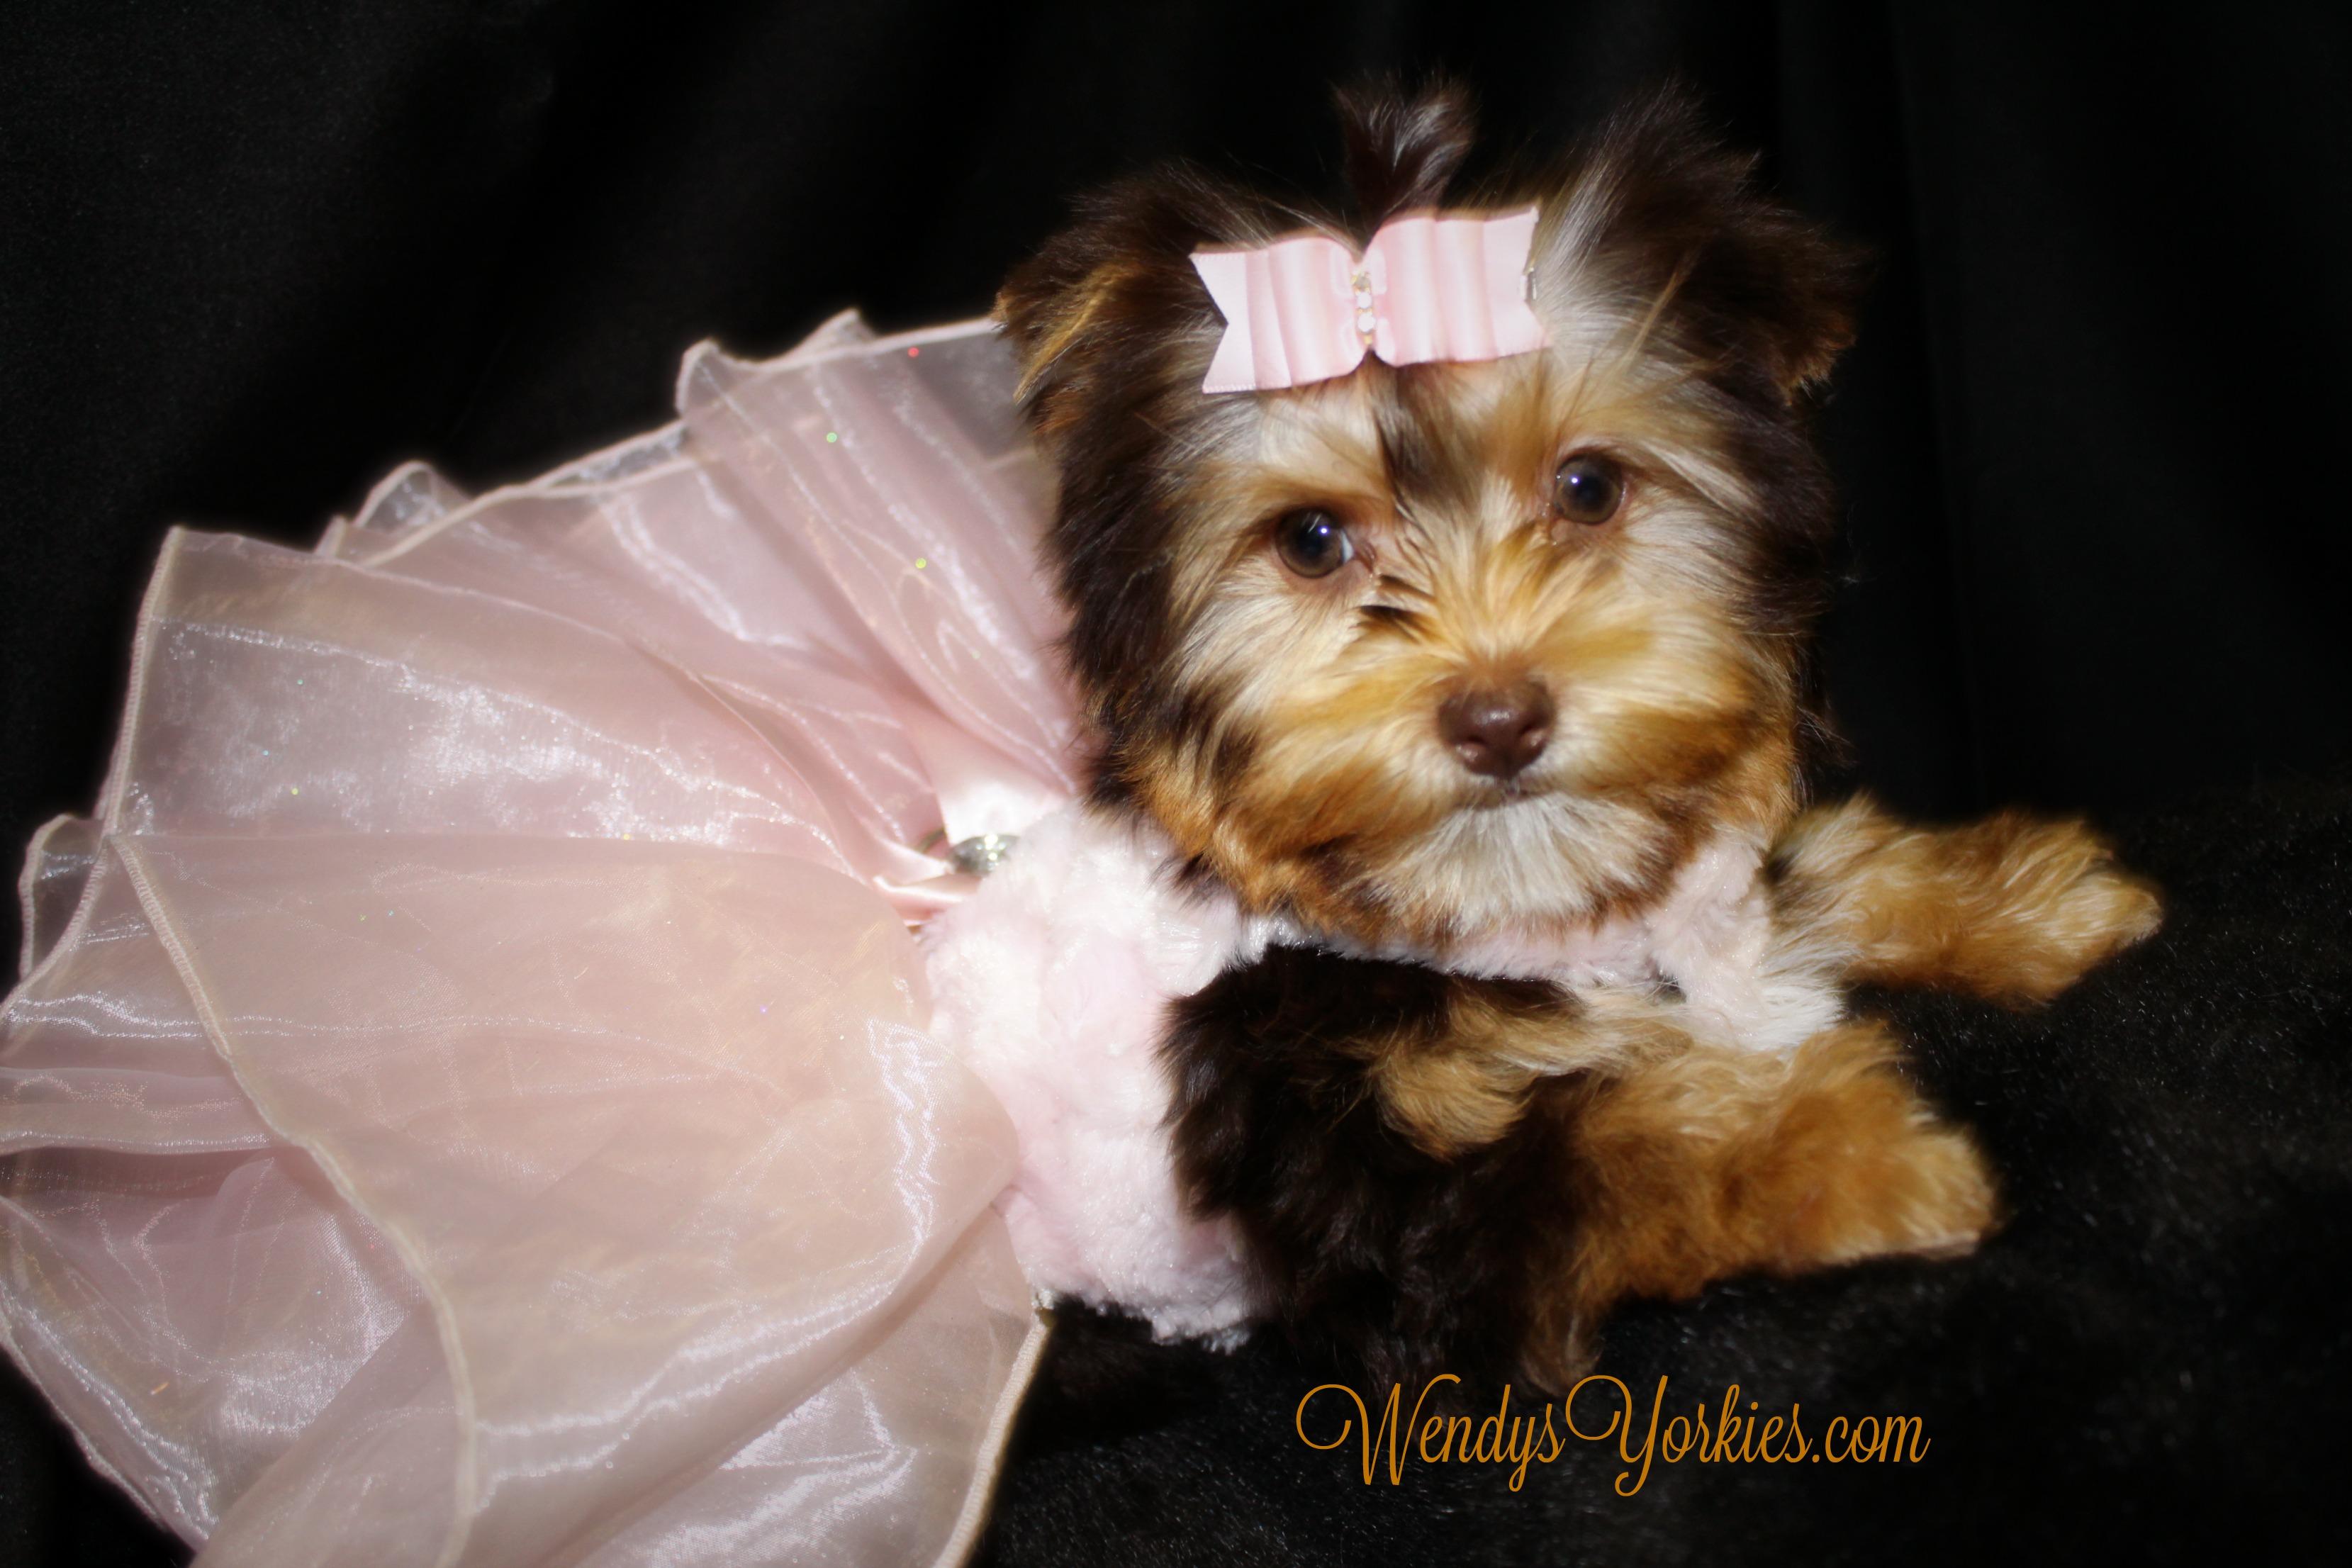 Chocolate Yorkie puppy for sale, WendysYorkies.com, Allie 2